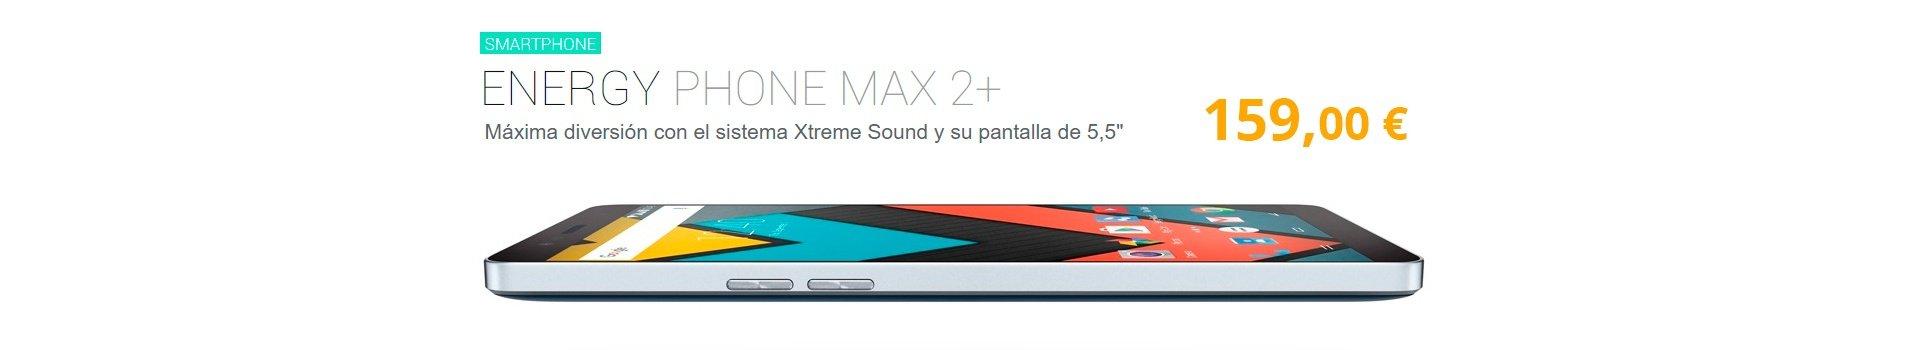 energy phone MAX 2